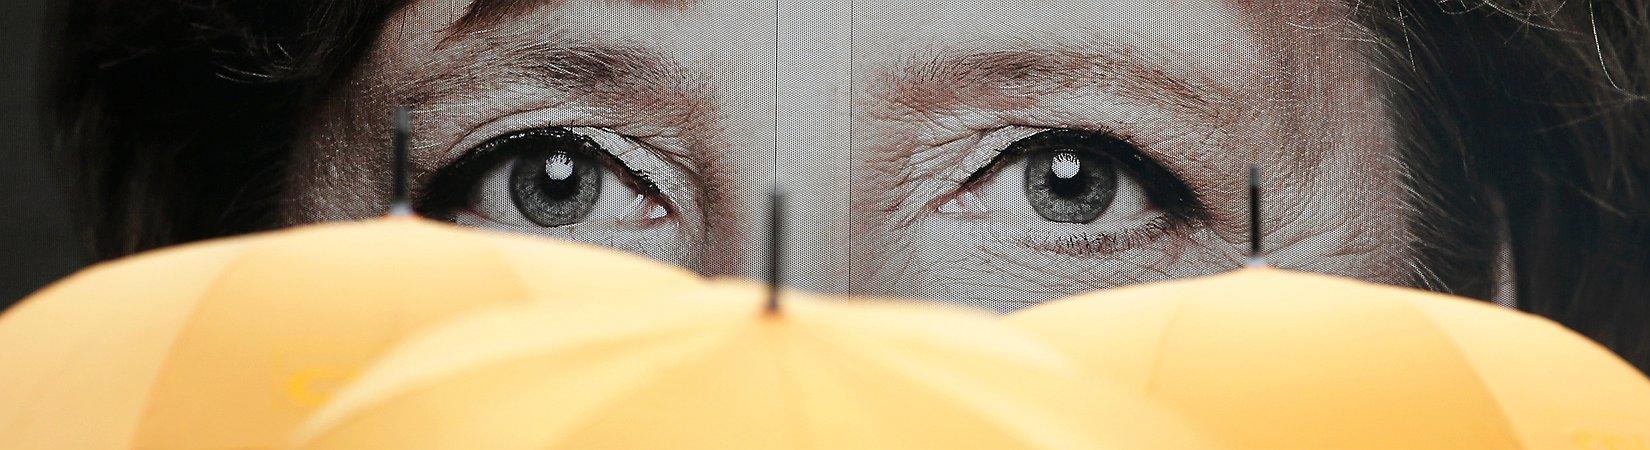 Deutsche Bank's stock slumps on speculations about state aid decline